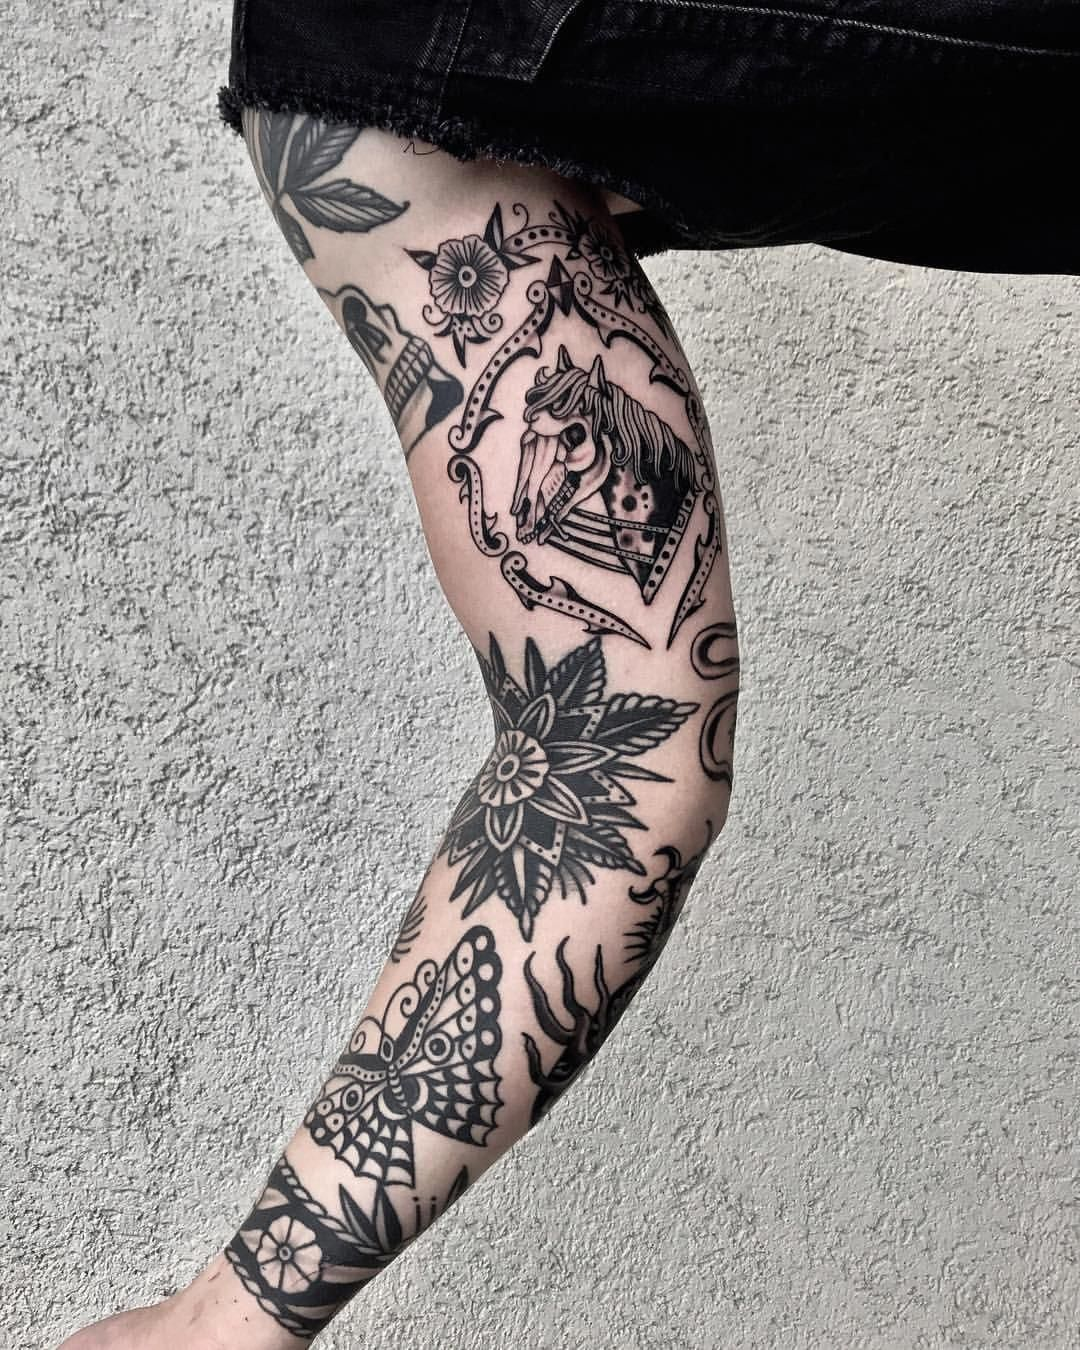 Tattoos For Men Black Ink Tattoos Traditional Black Tattoo Tattoos For Guys